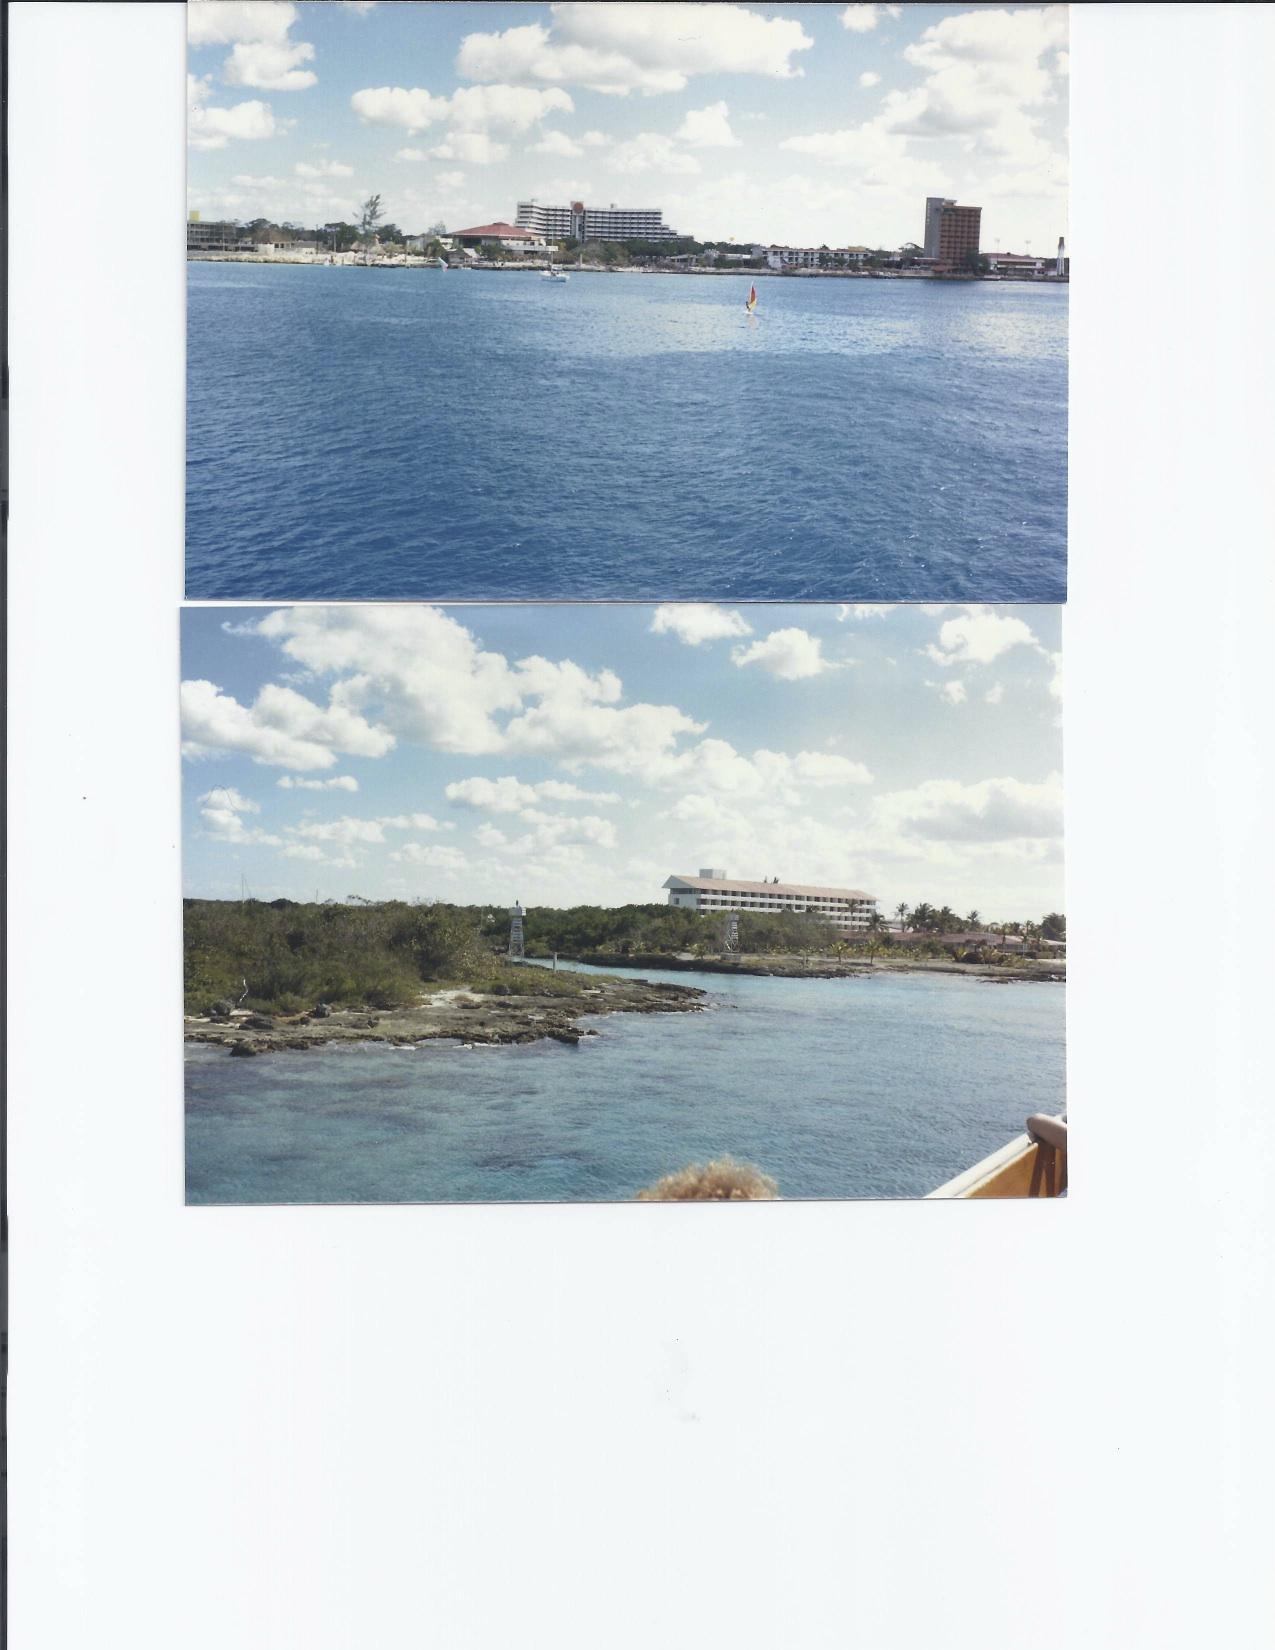 Veracruz 16